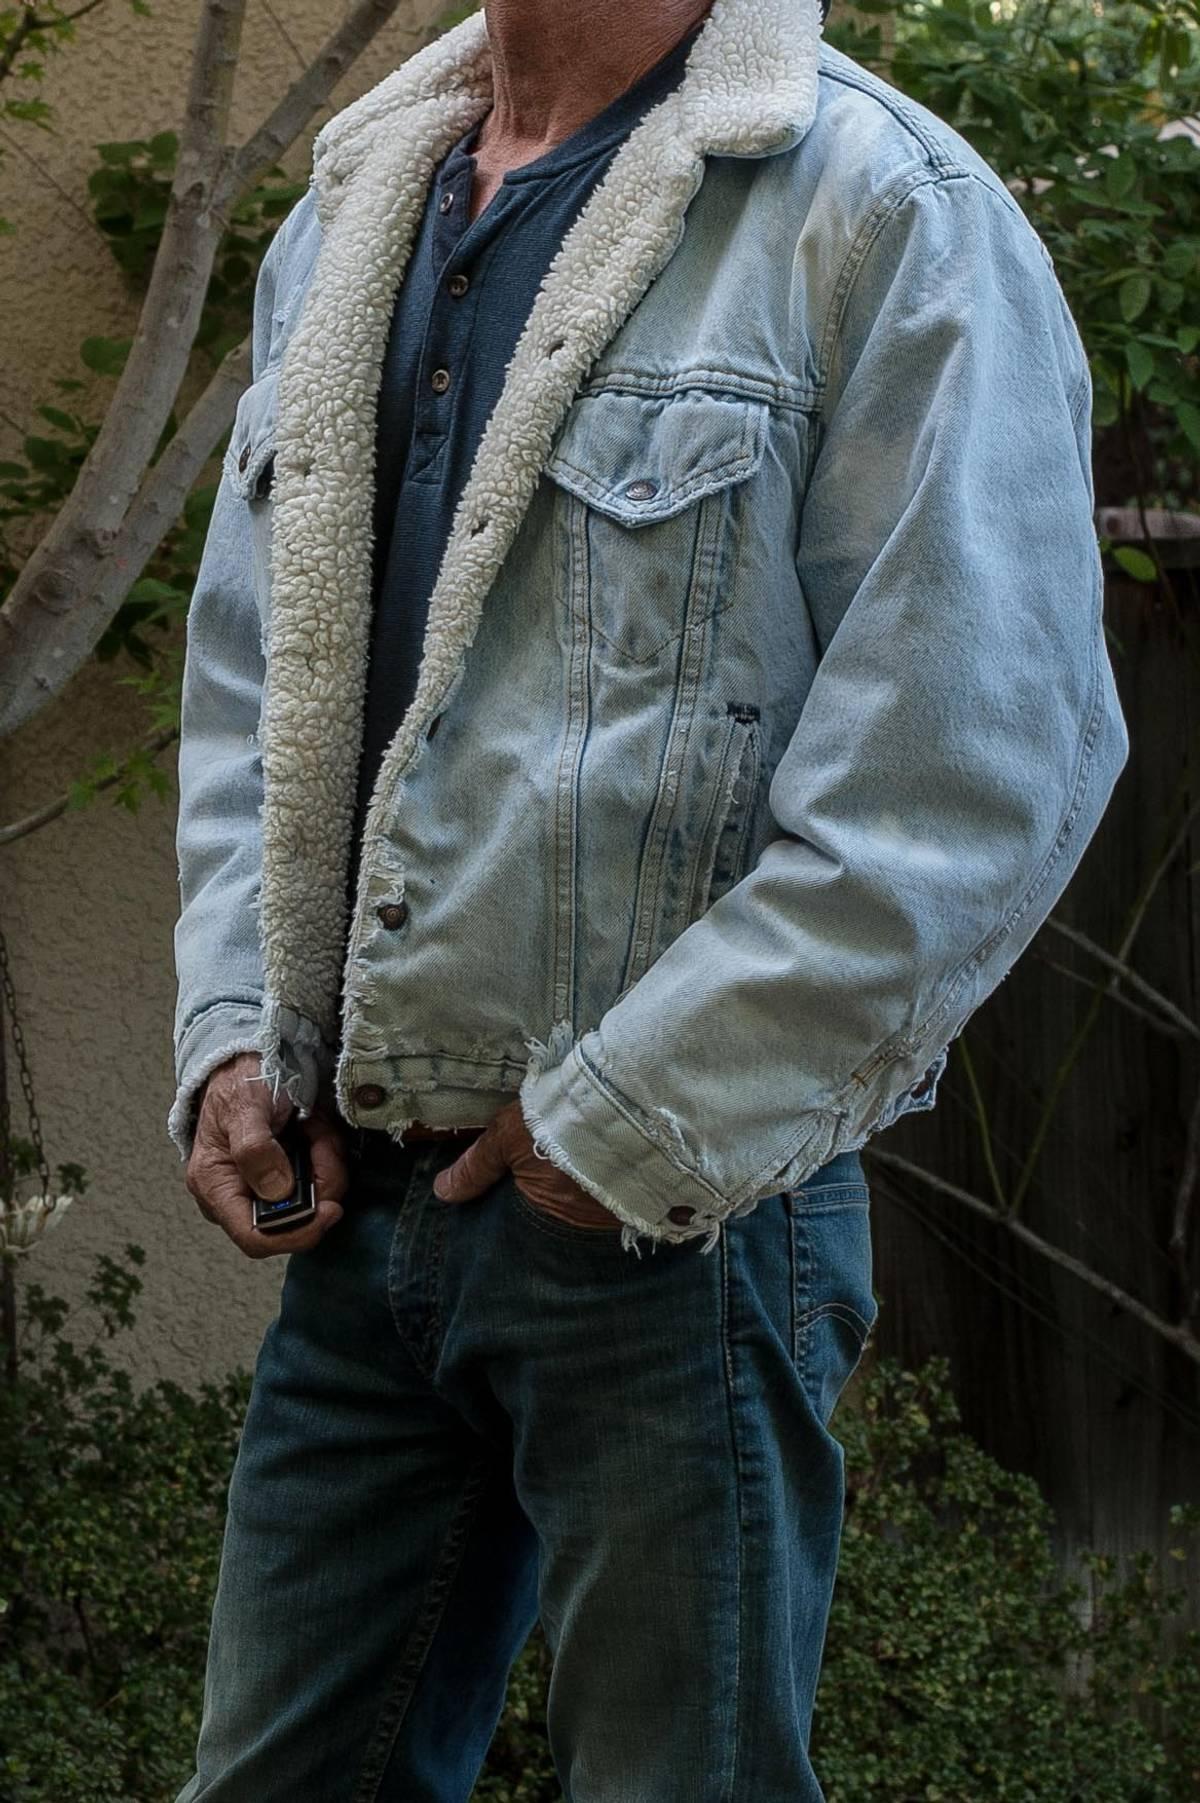 bd8408a299fcd Levi s. Vintage Levis Distressed Sherpa Fleece Lined Distressed Jean Jacket  ...